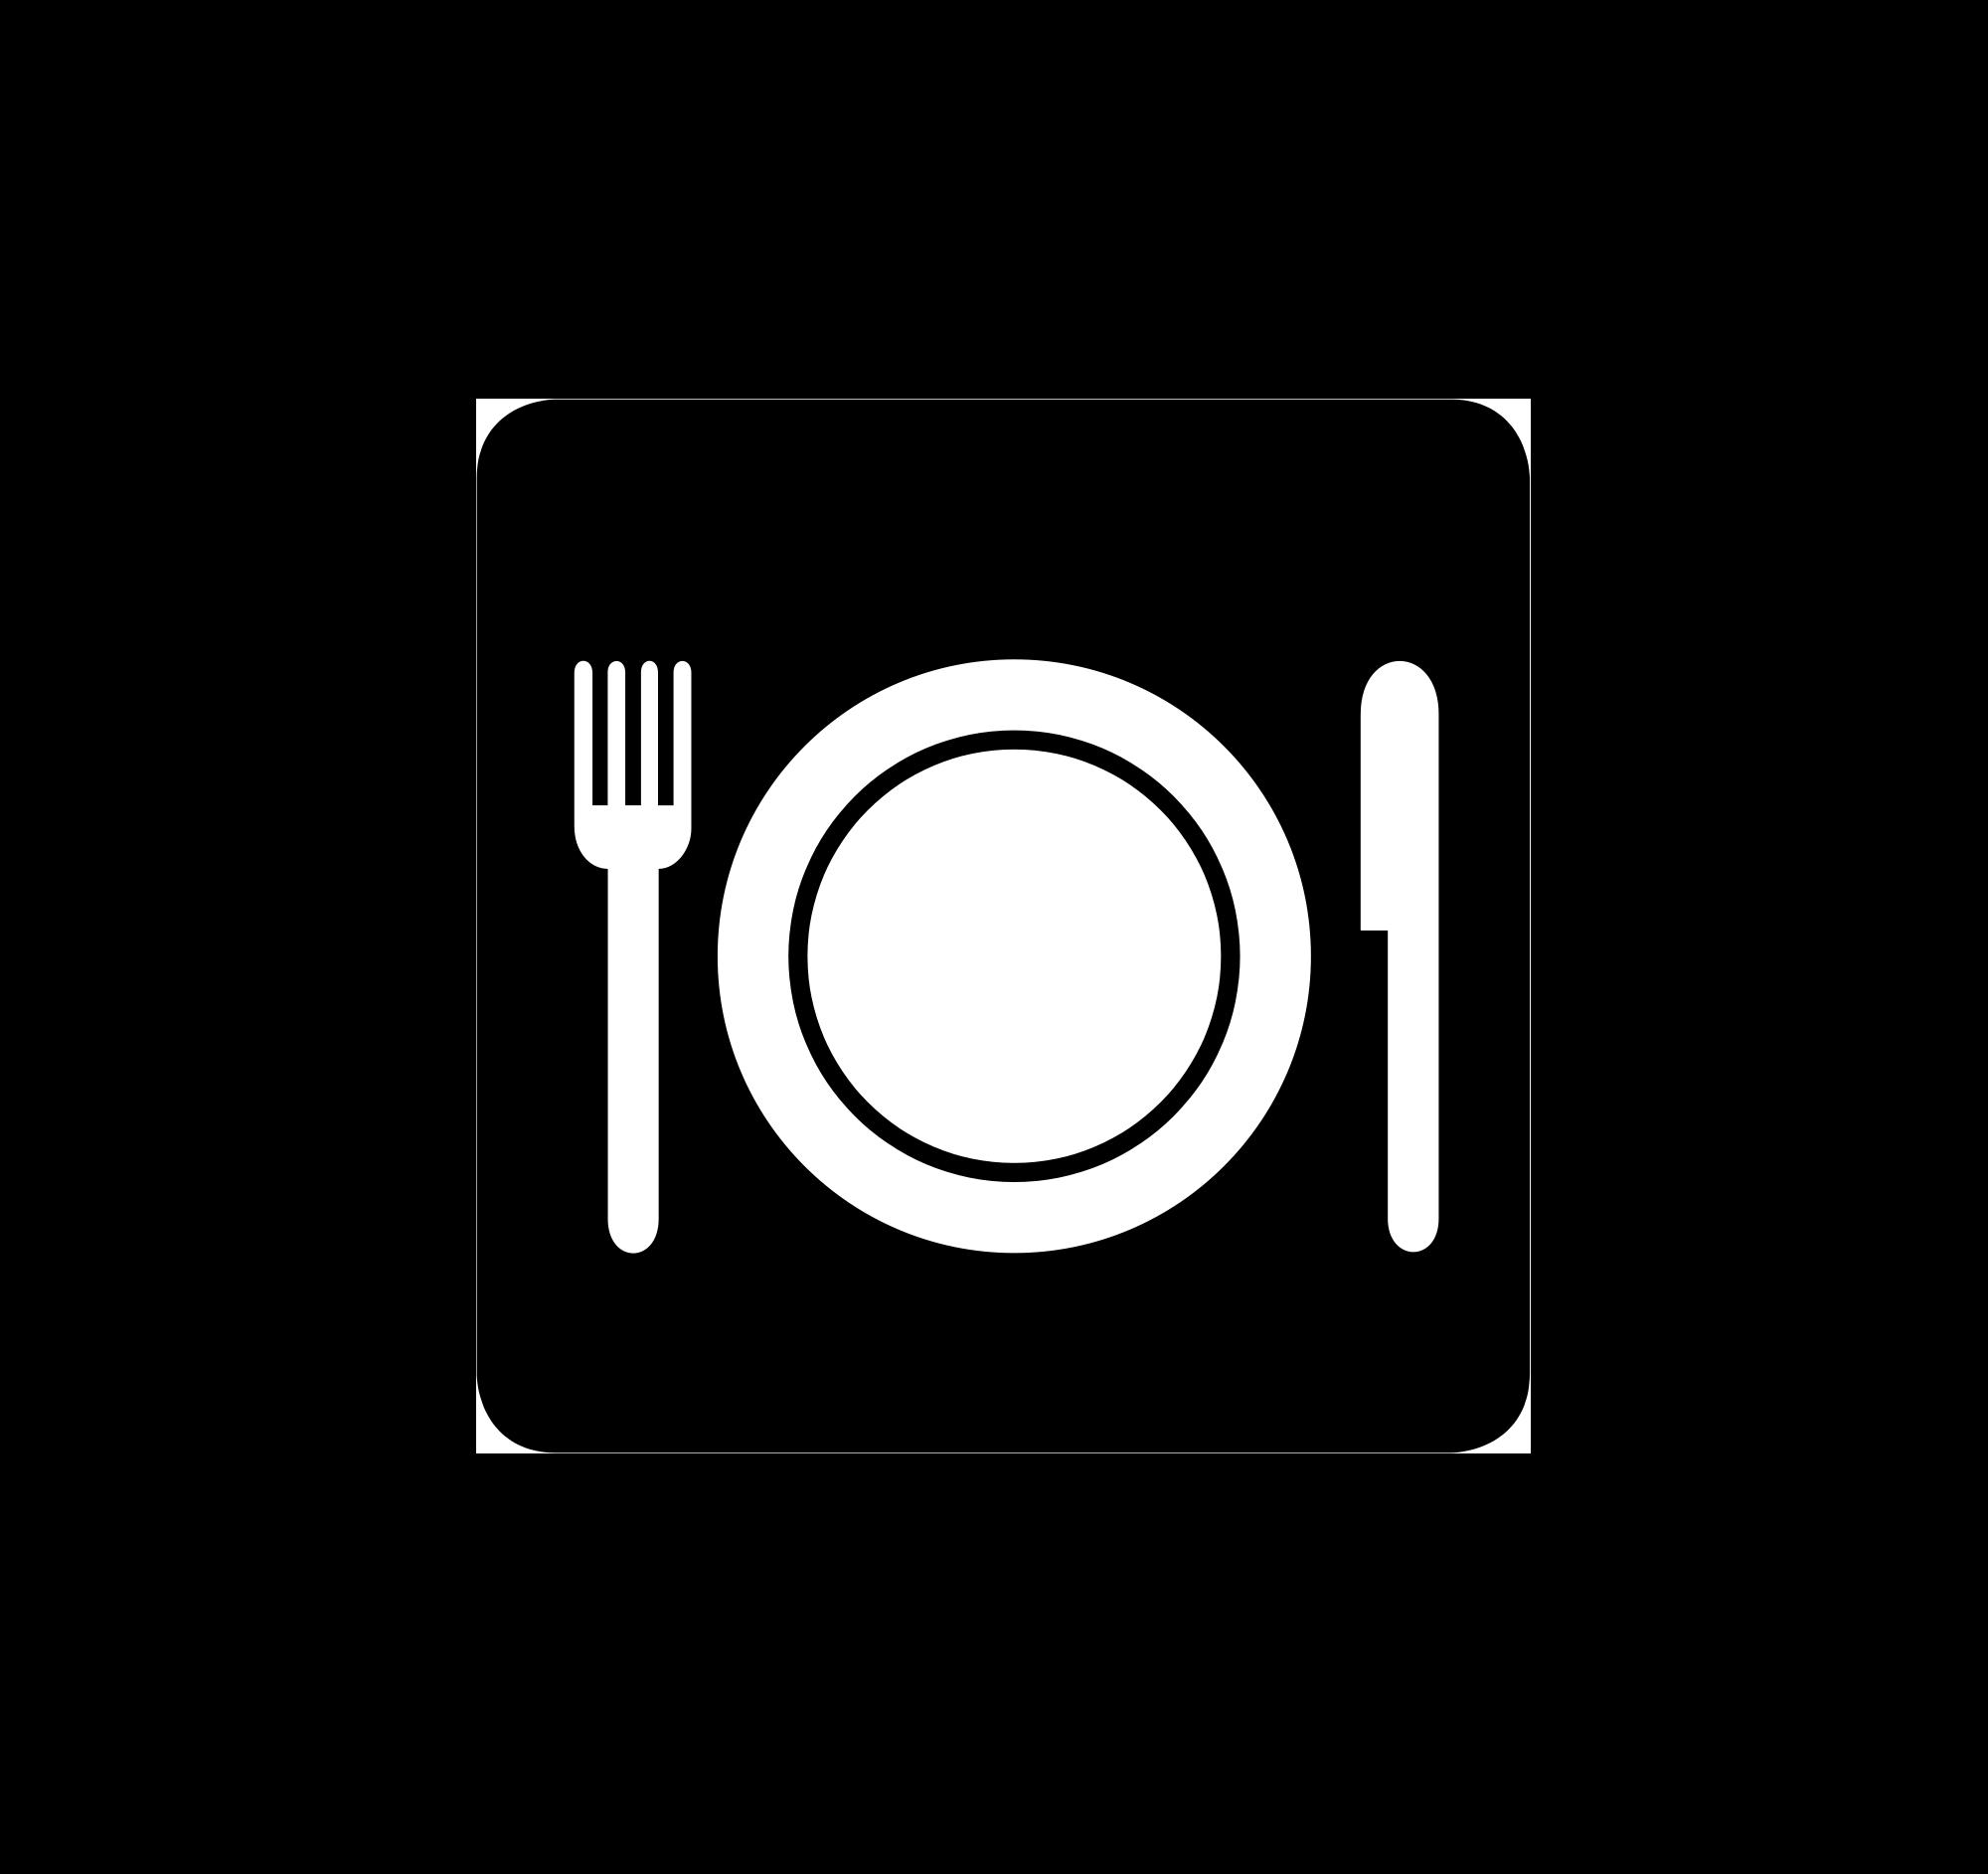 2000x1885 Png Eat Transparent Eat.png Images. Pluspng